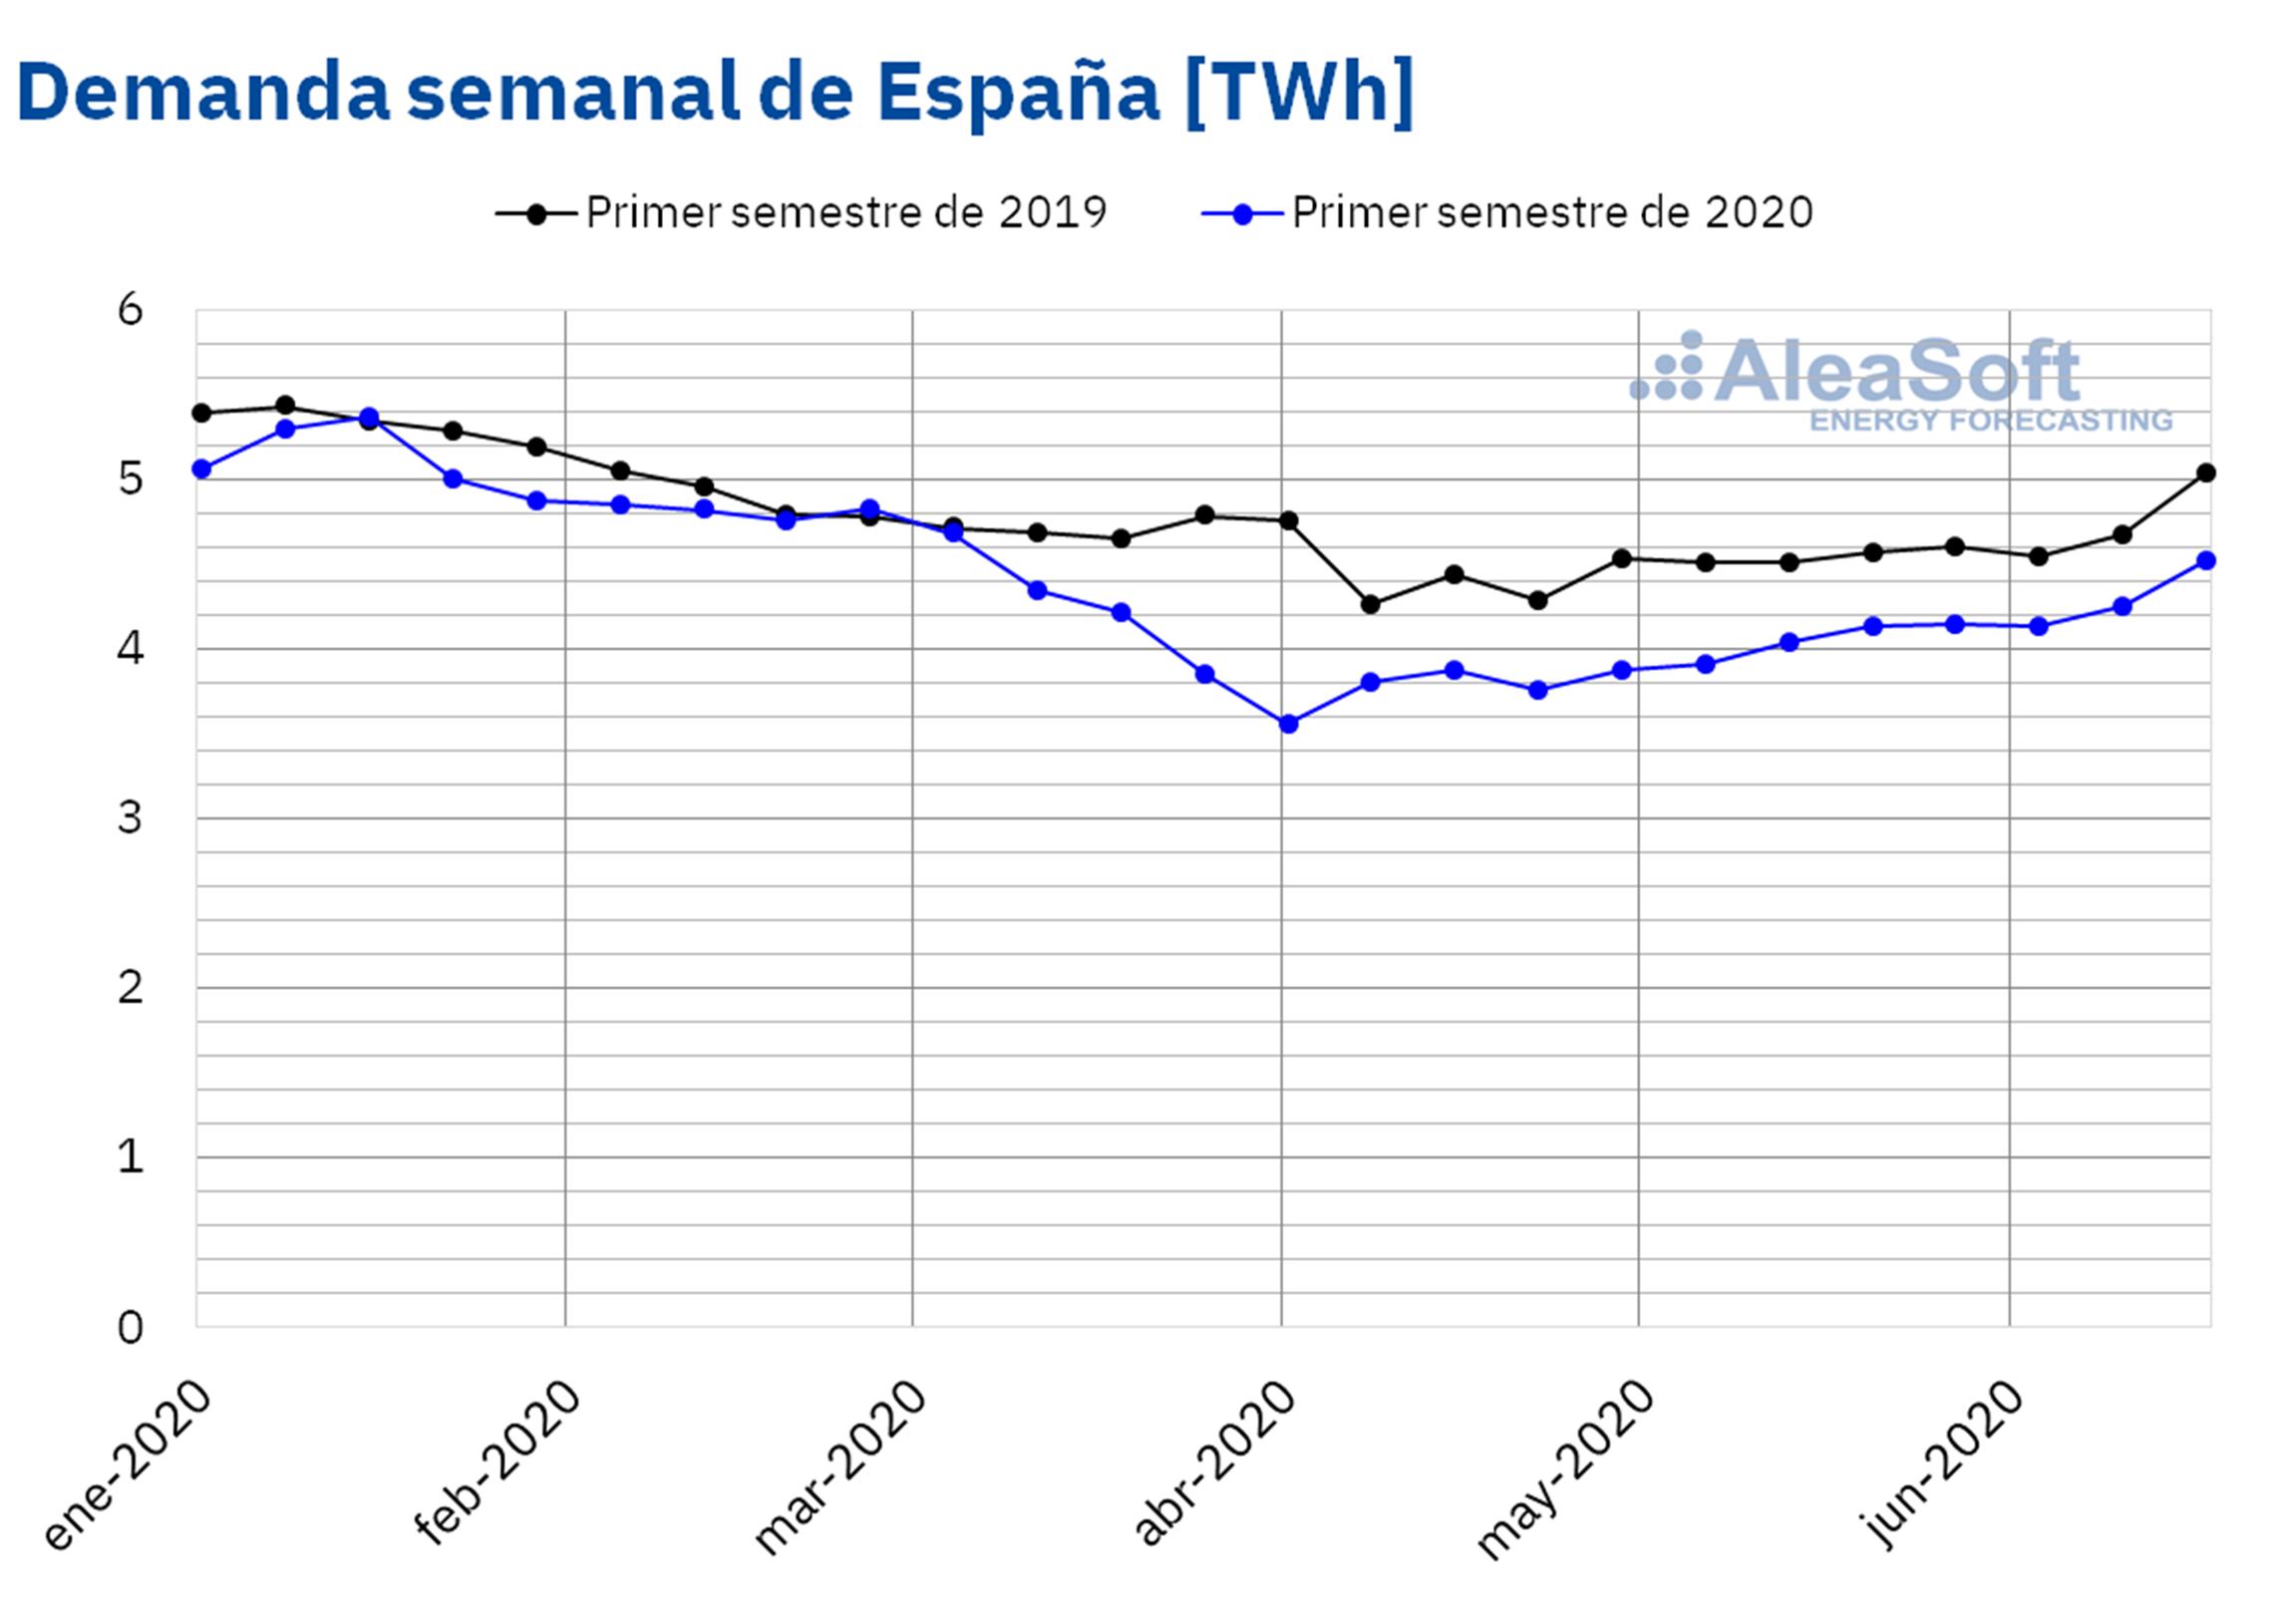 AleaSoft - Demanda electrica semanal Espanna